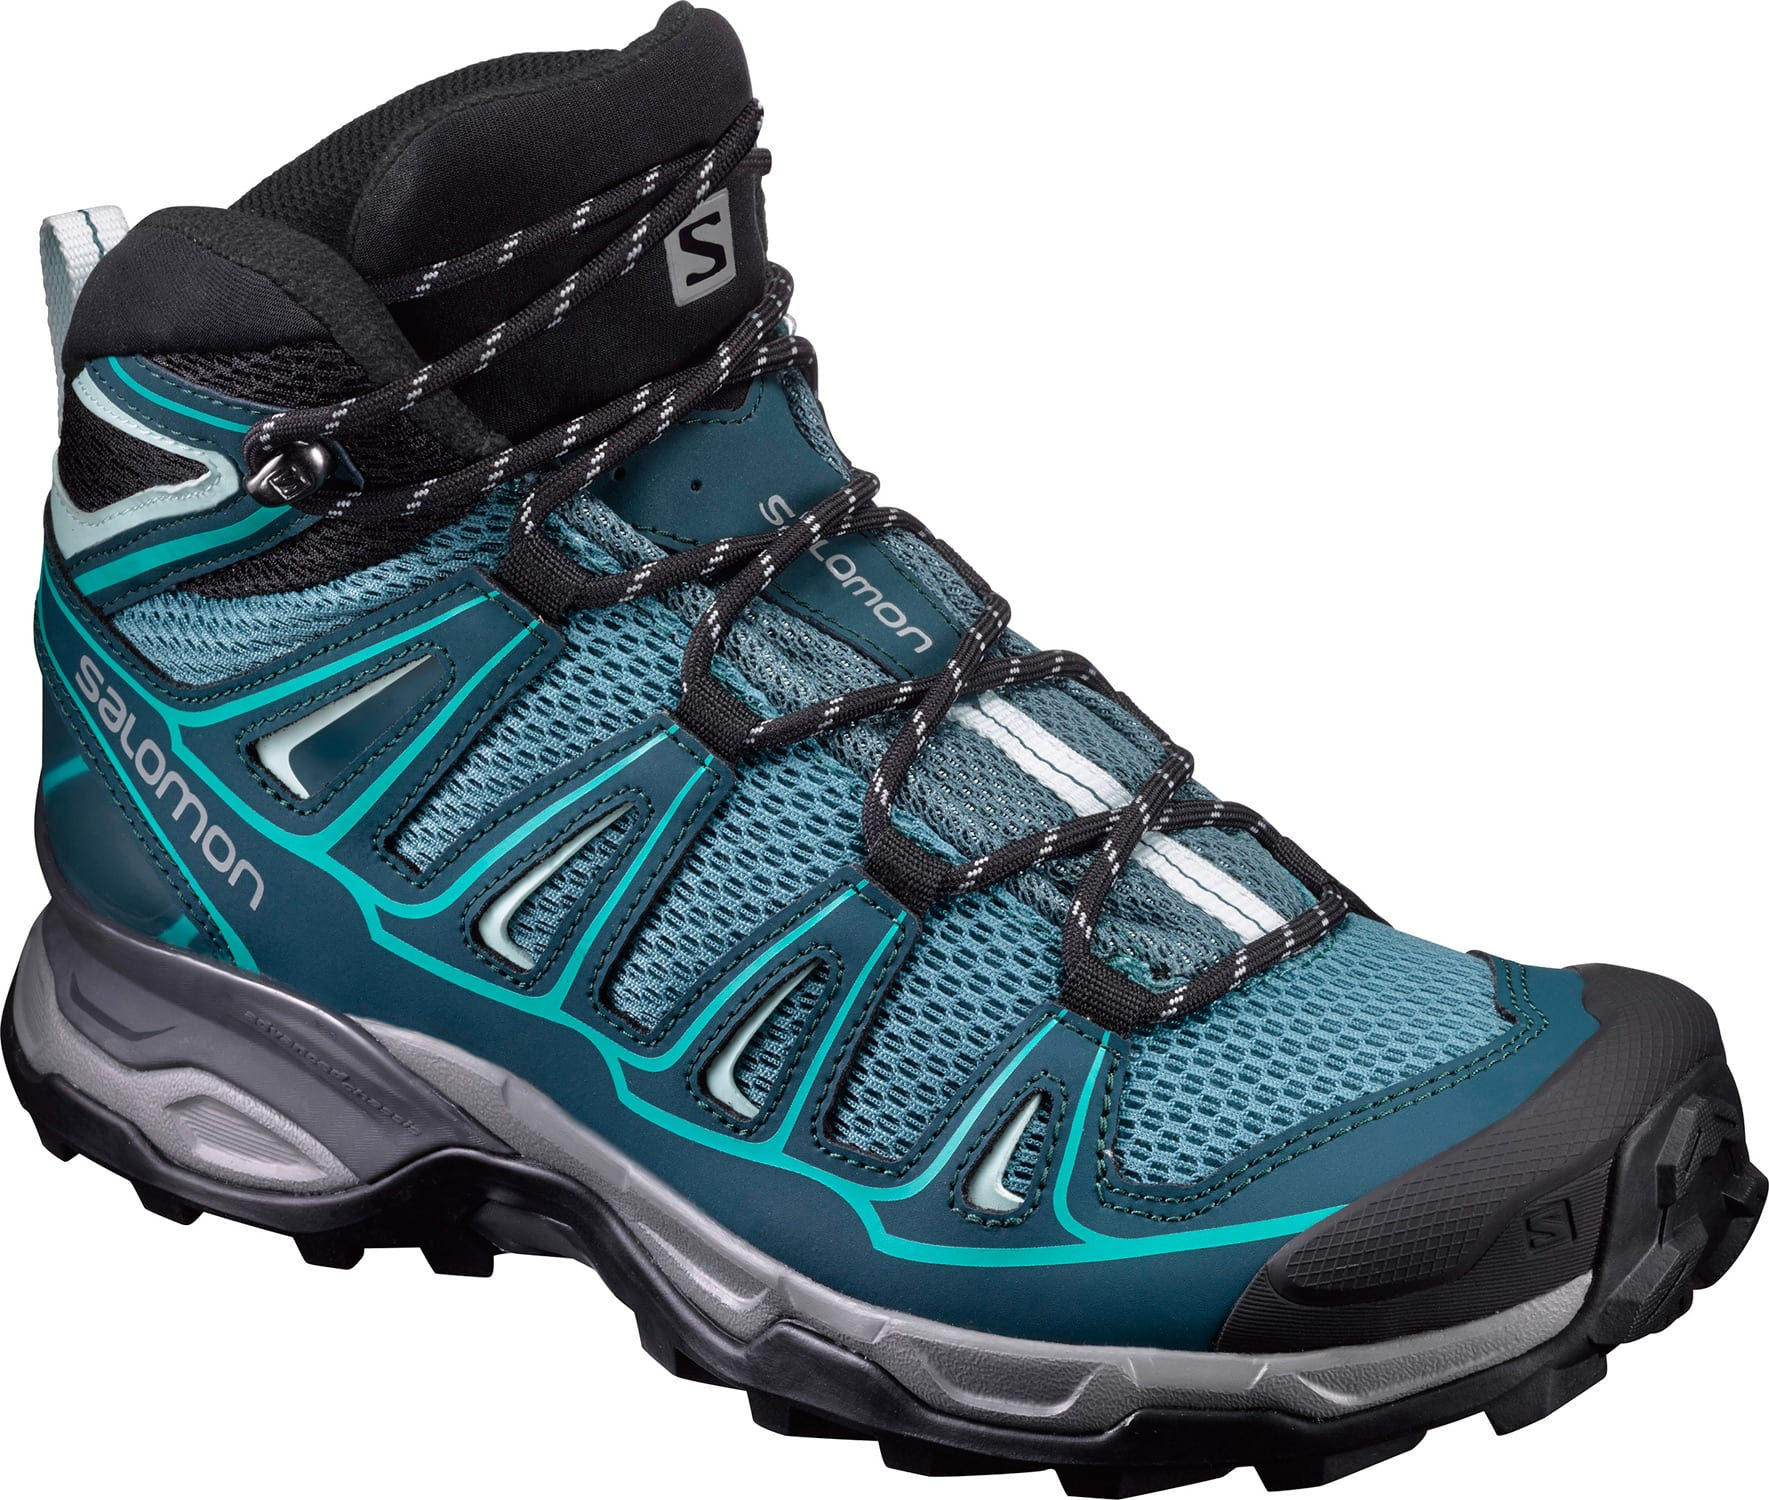 Salomon X Ultra Mid Aero Hiking Boots - Womens 2018